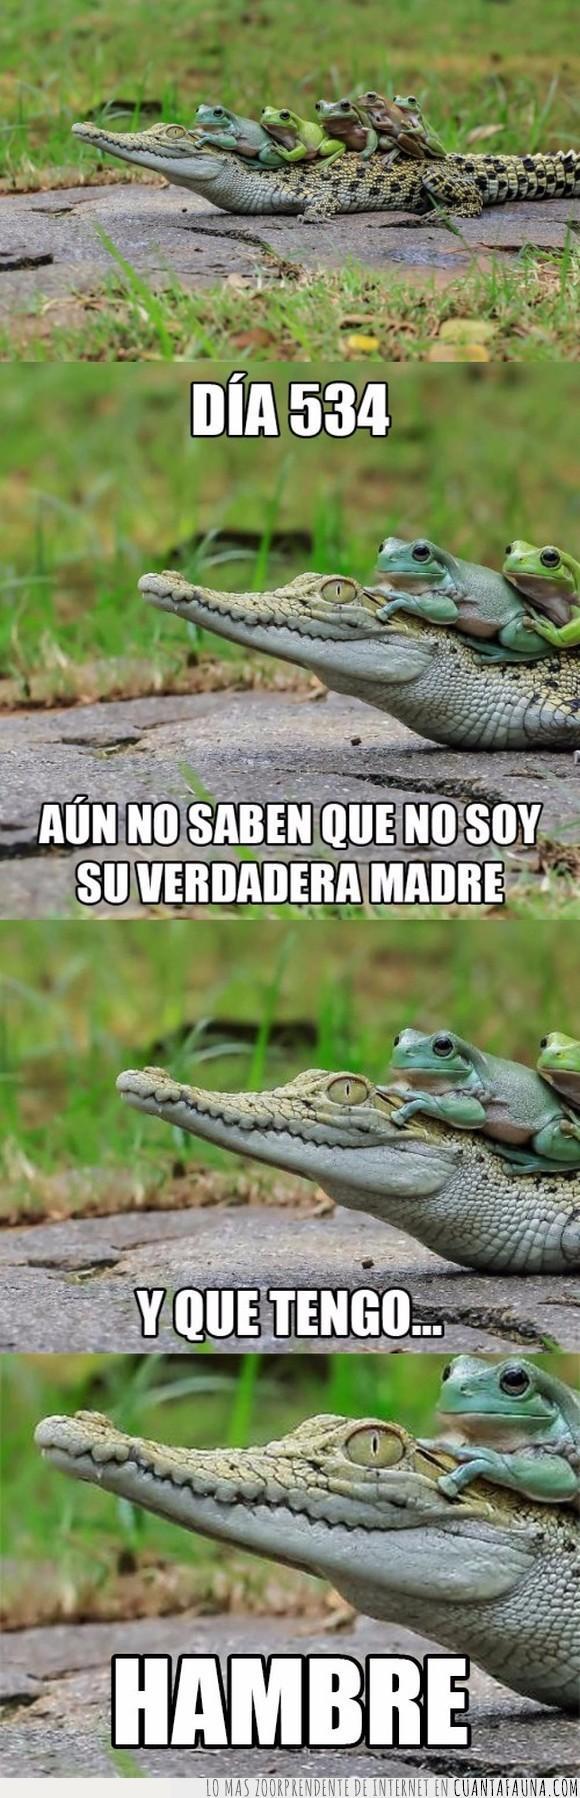 cocodrilo,madre,ranas